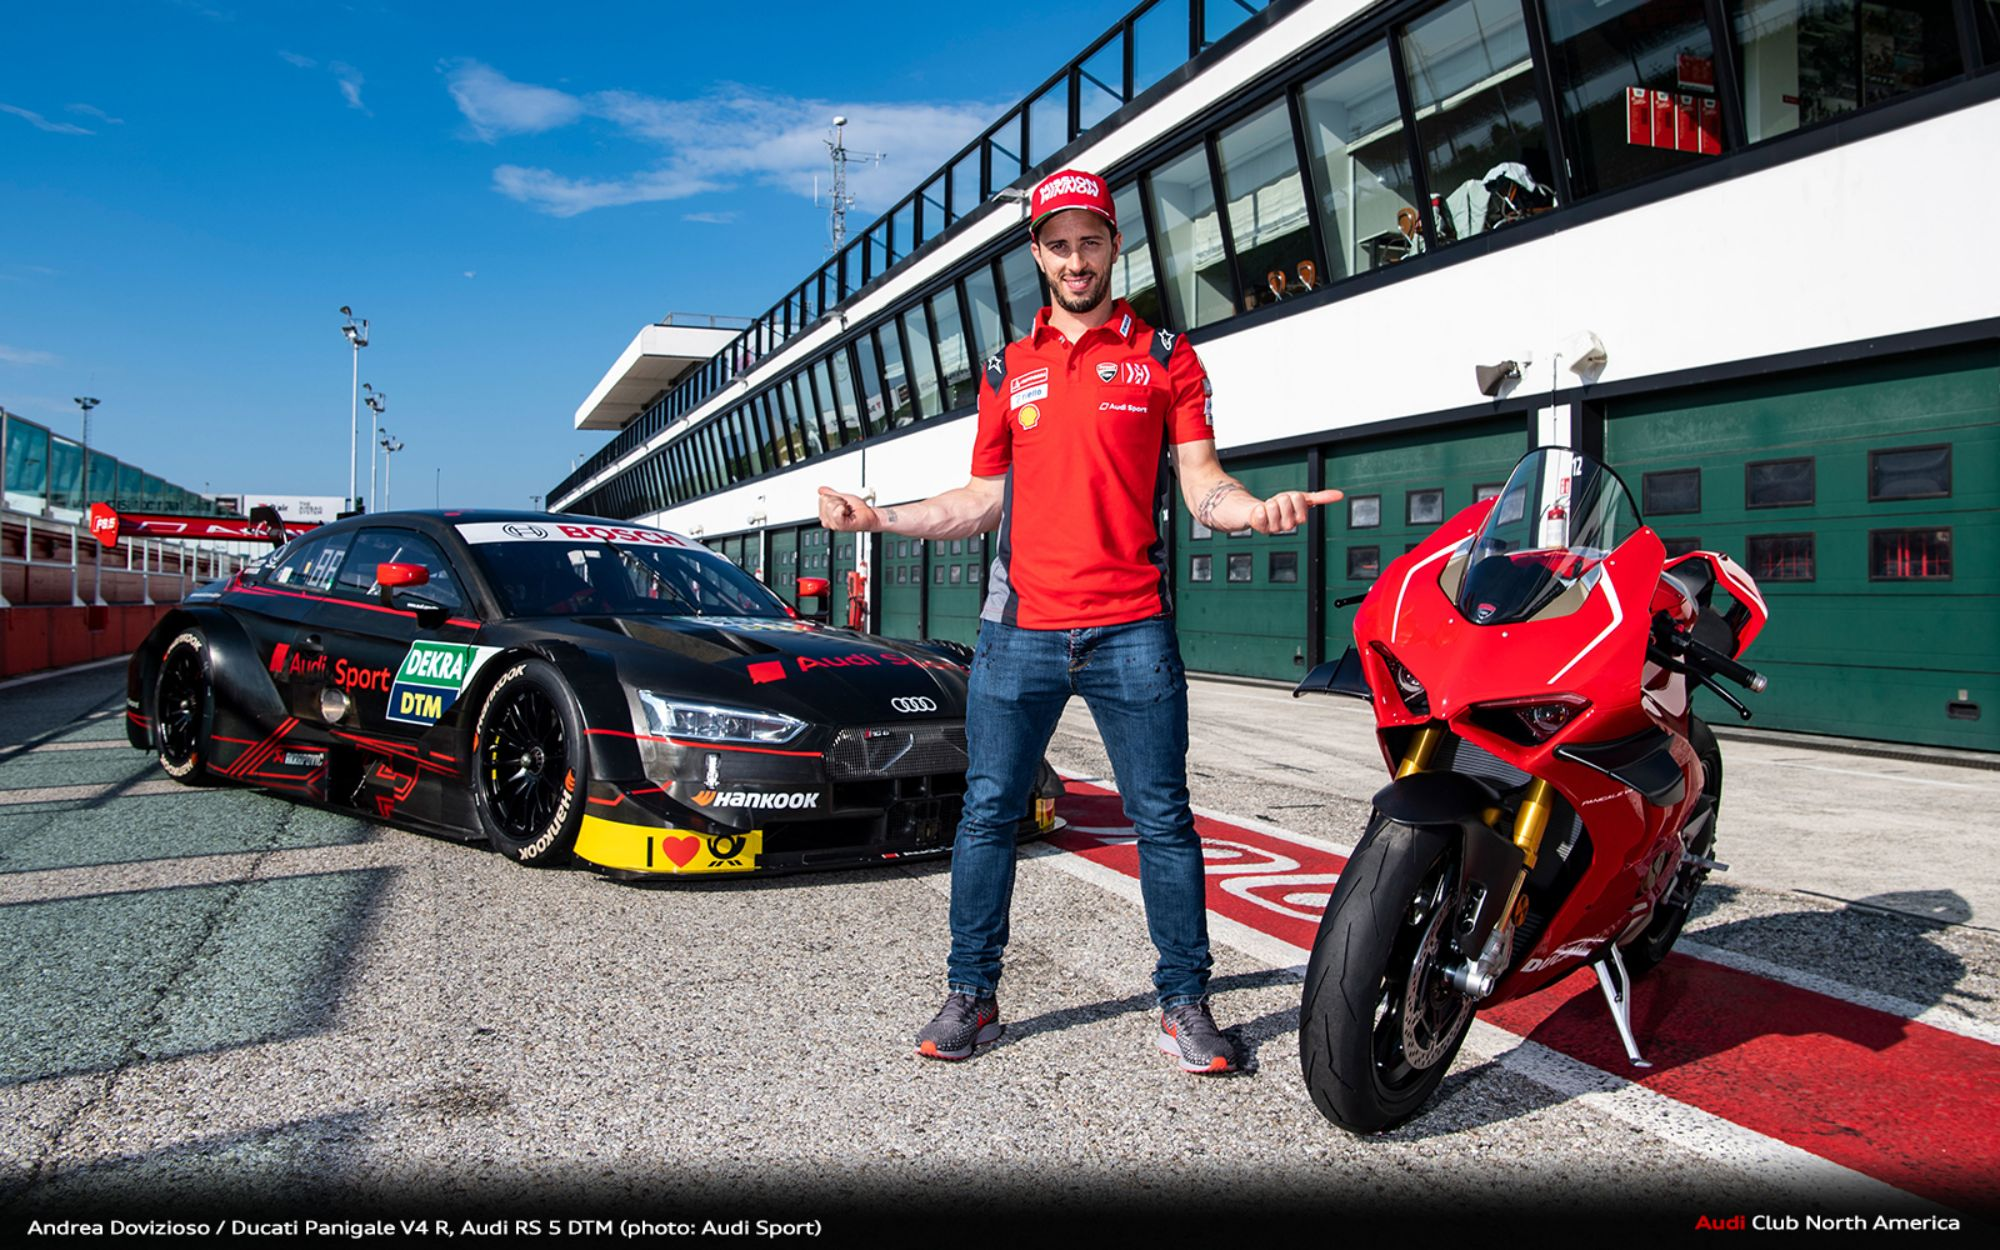 MotoGP Star Andrea Dovizioso Heads To DTM Debut - Audi Club North America